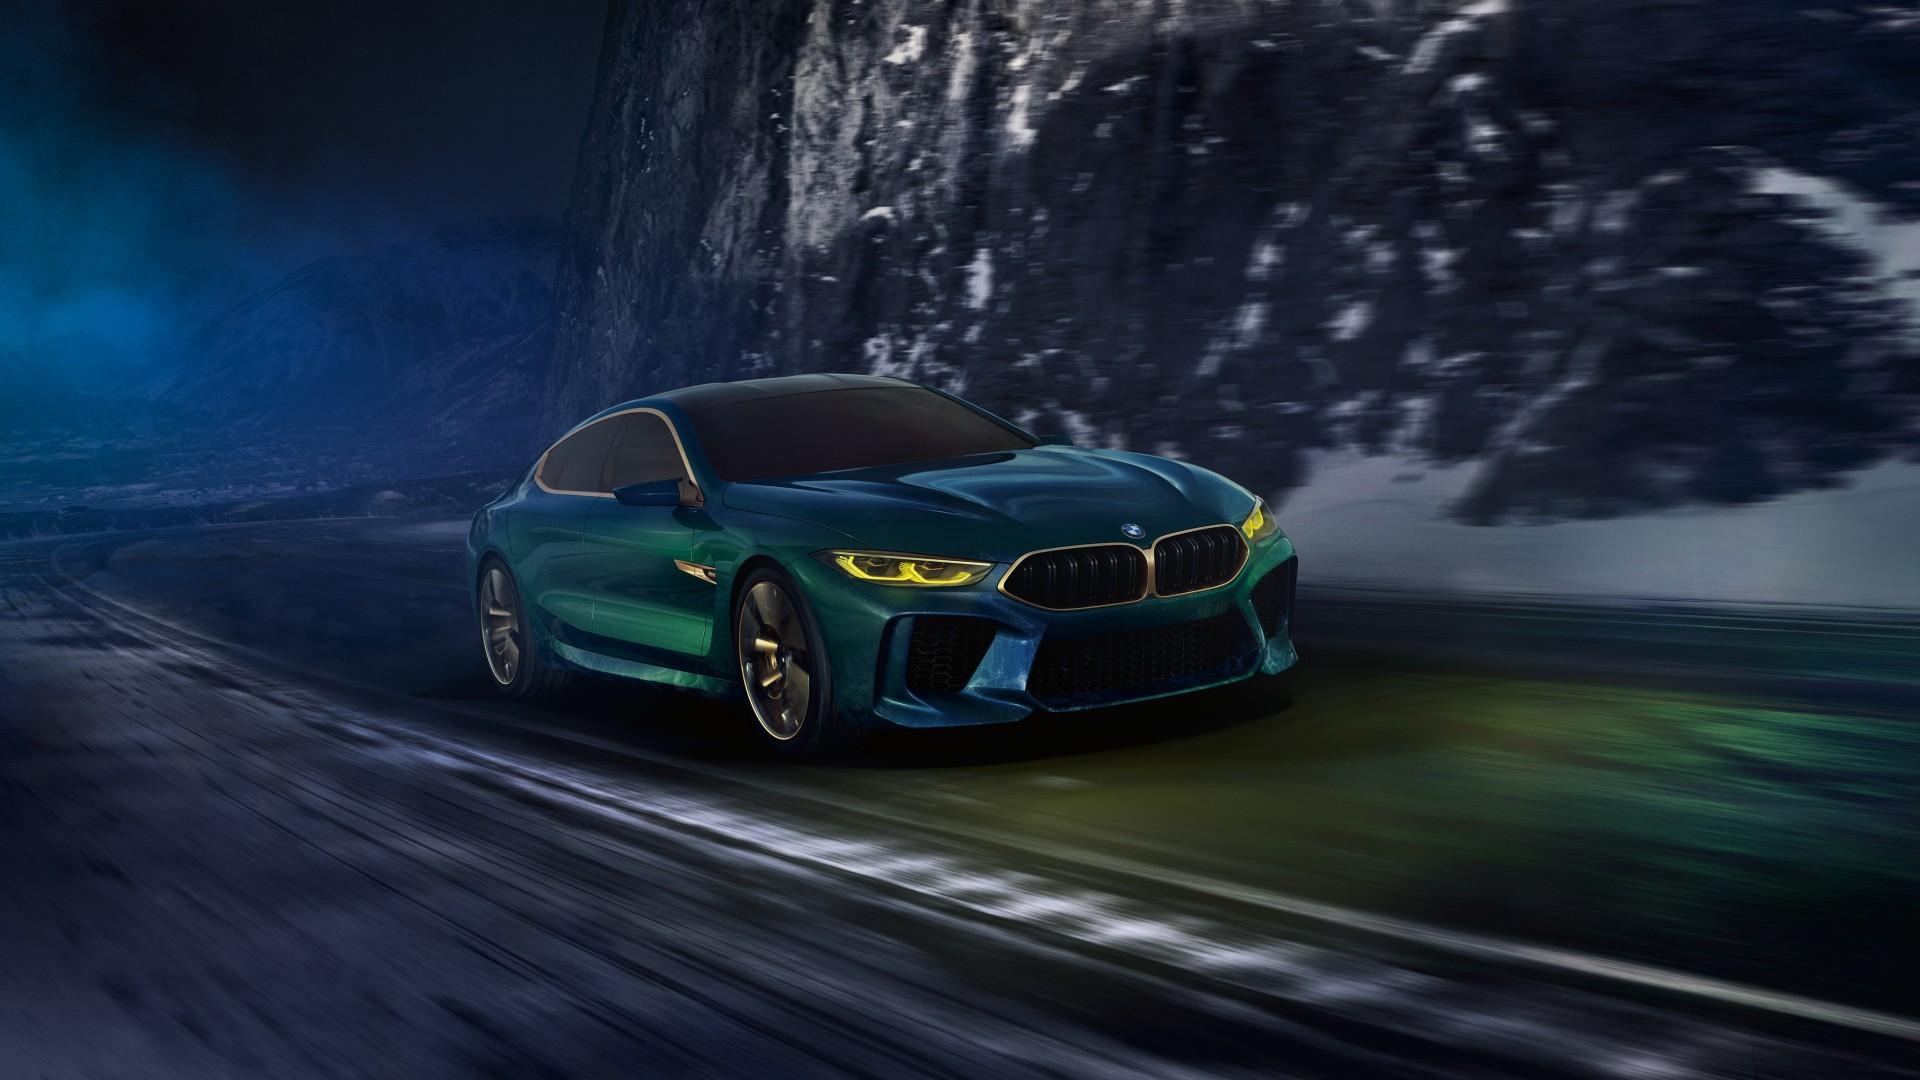 2018 BMW Concept M8 Gran Coupe 4K 9 Wallpaper | HD Car ...